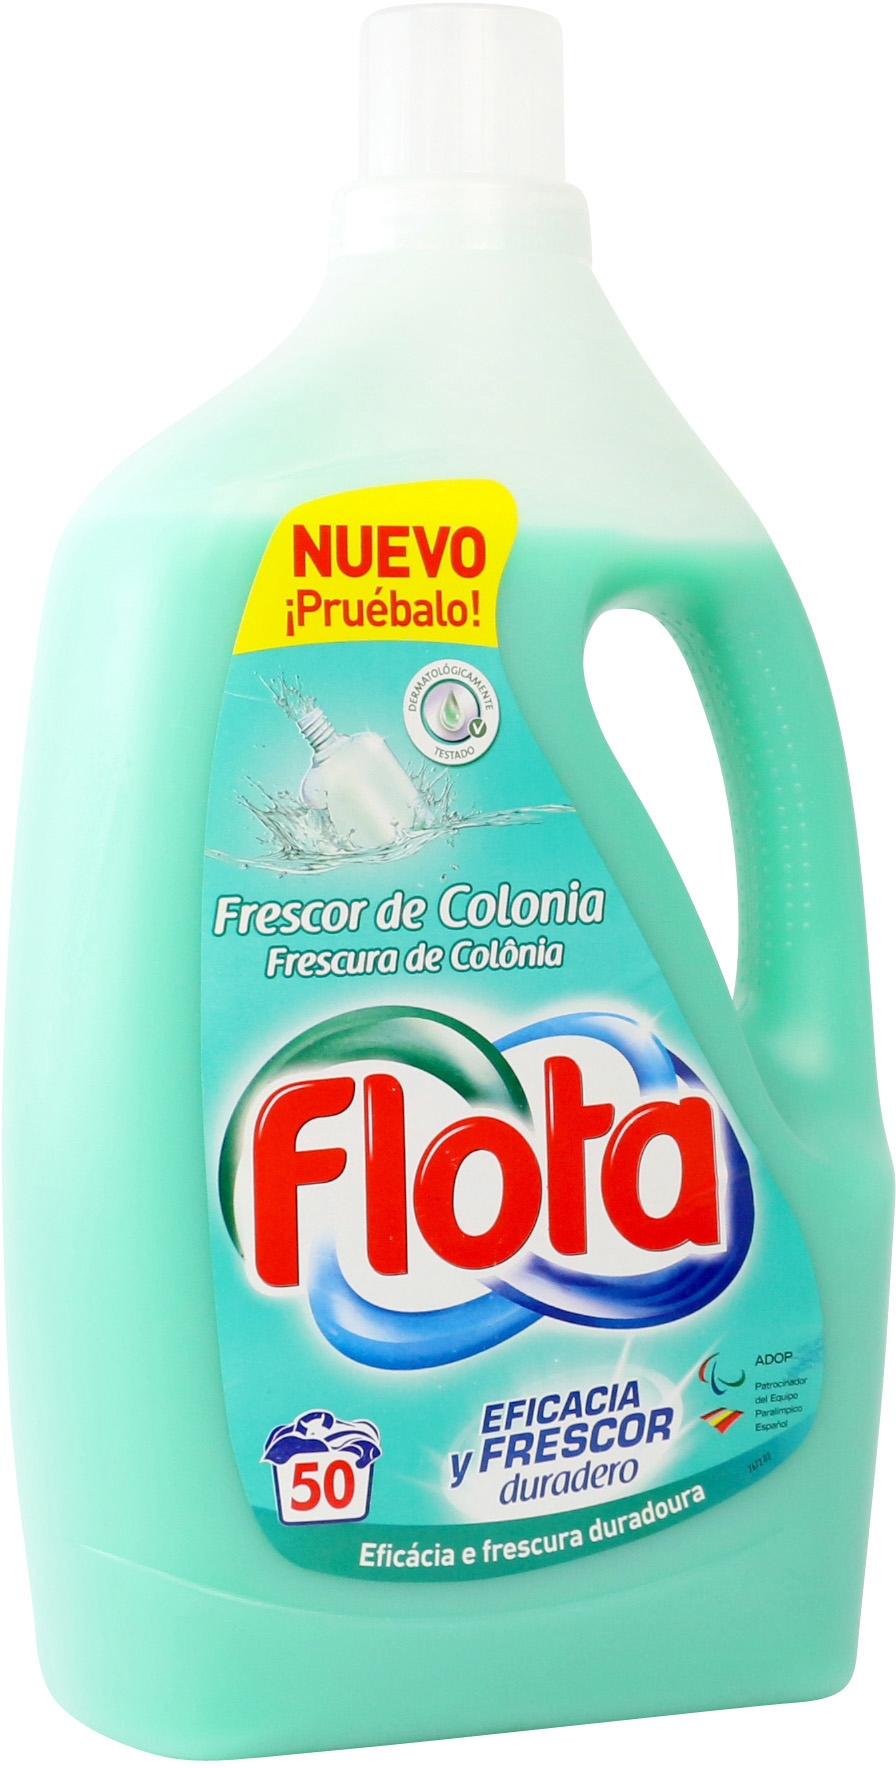 An Lisis De Flota Frescor De Colonia L Quido Comparador De  ~ Mejor Detergente Lavadora Calidad Precio